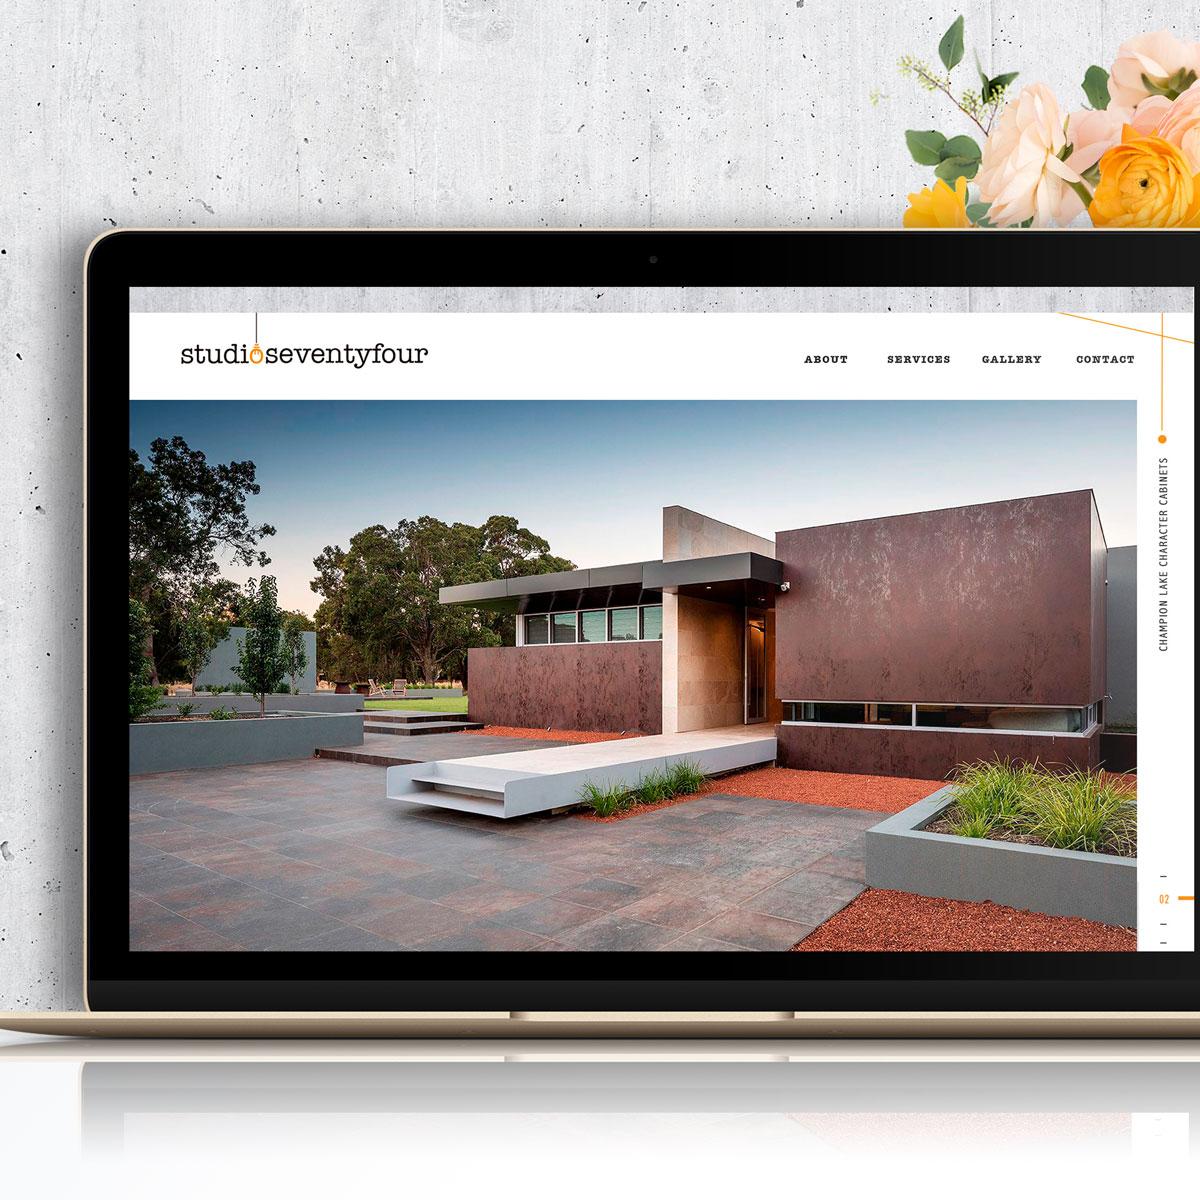 Studio-seventy-four-website-desubg.jpg